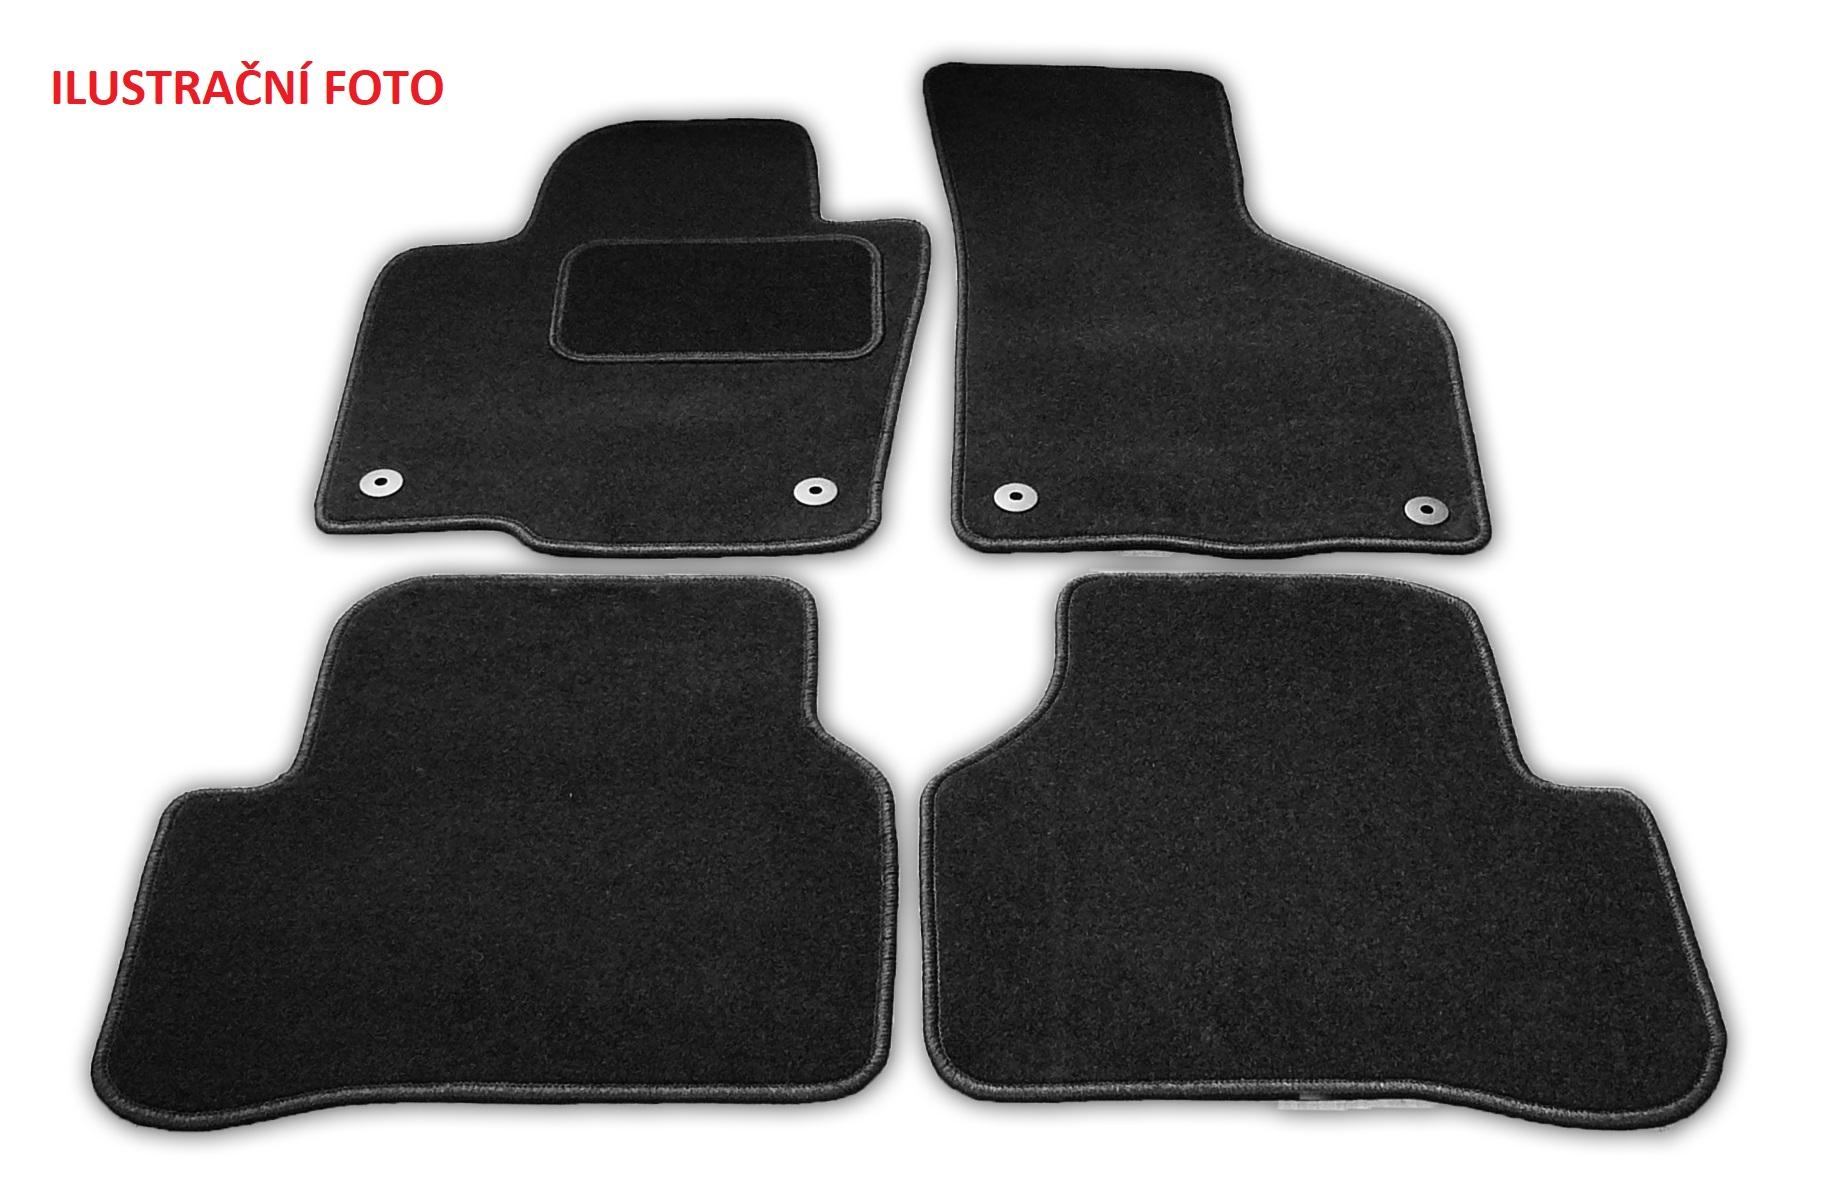 Automega Textilní autokoberce Standard BMW 5 F10/F11 2014-